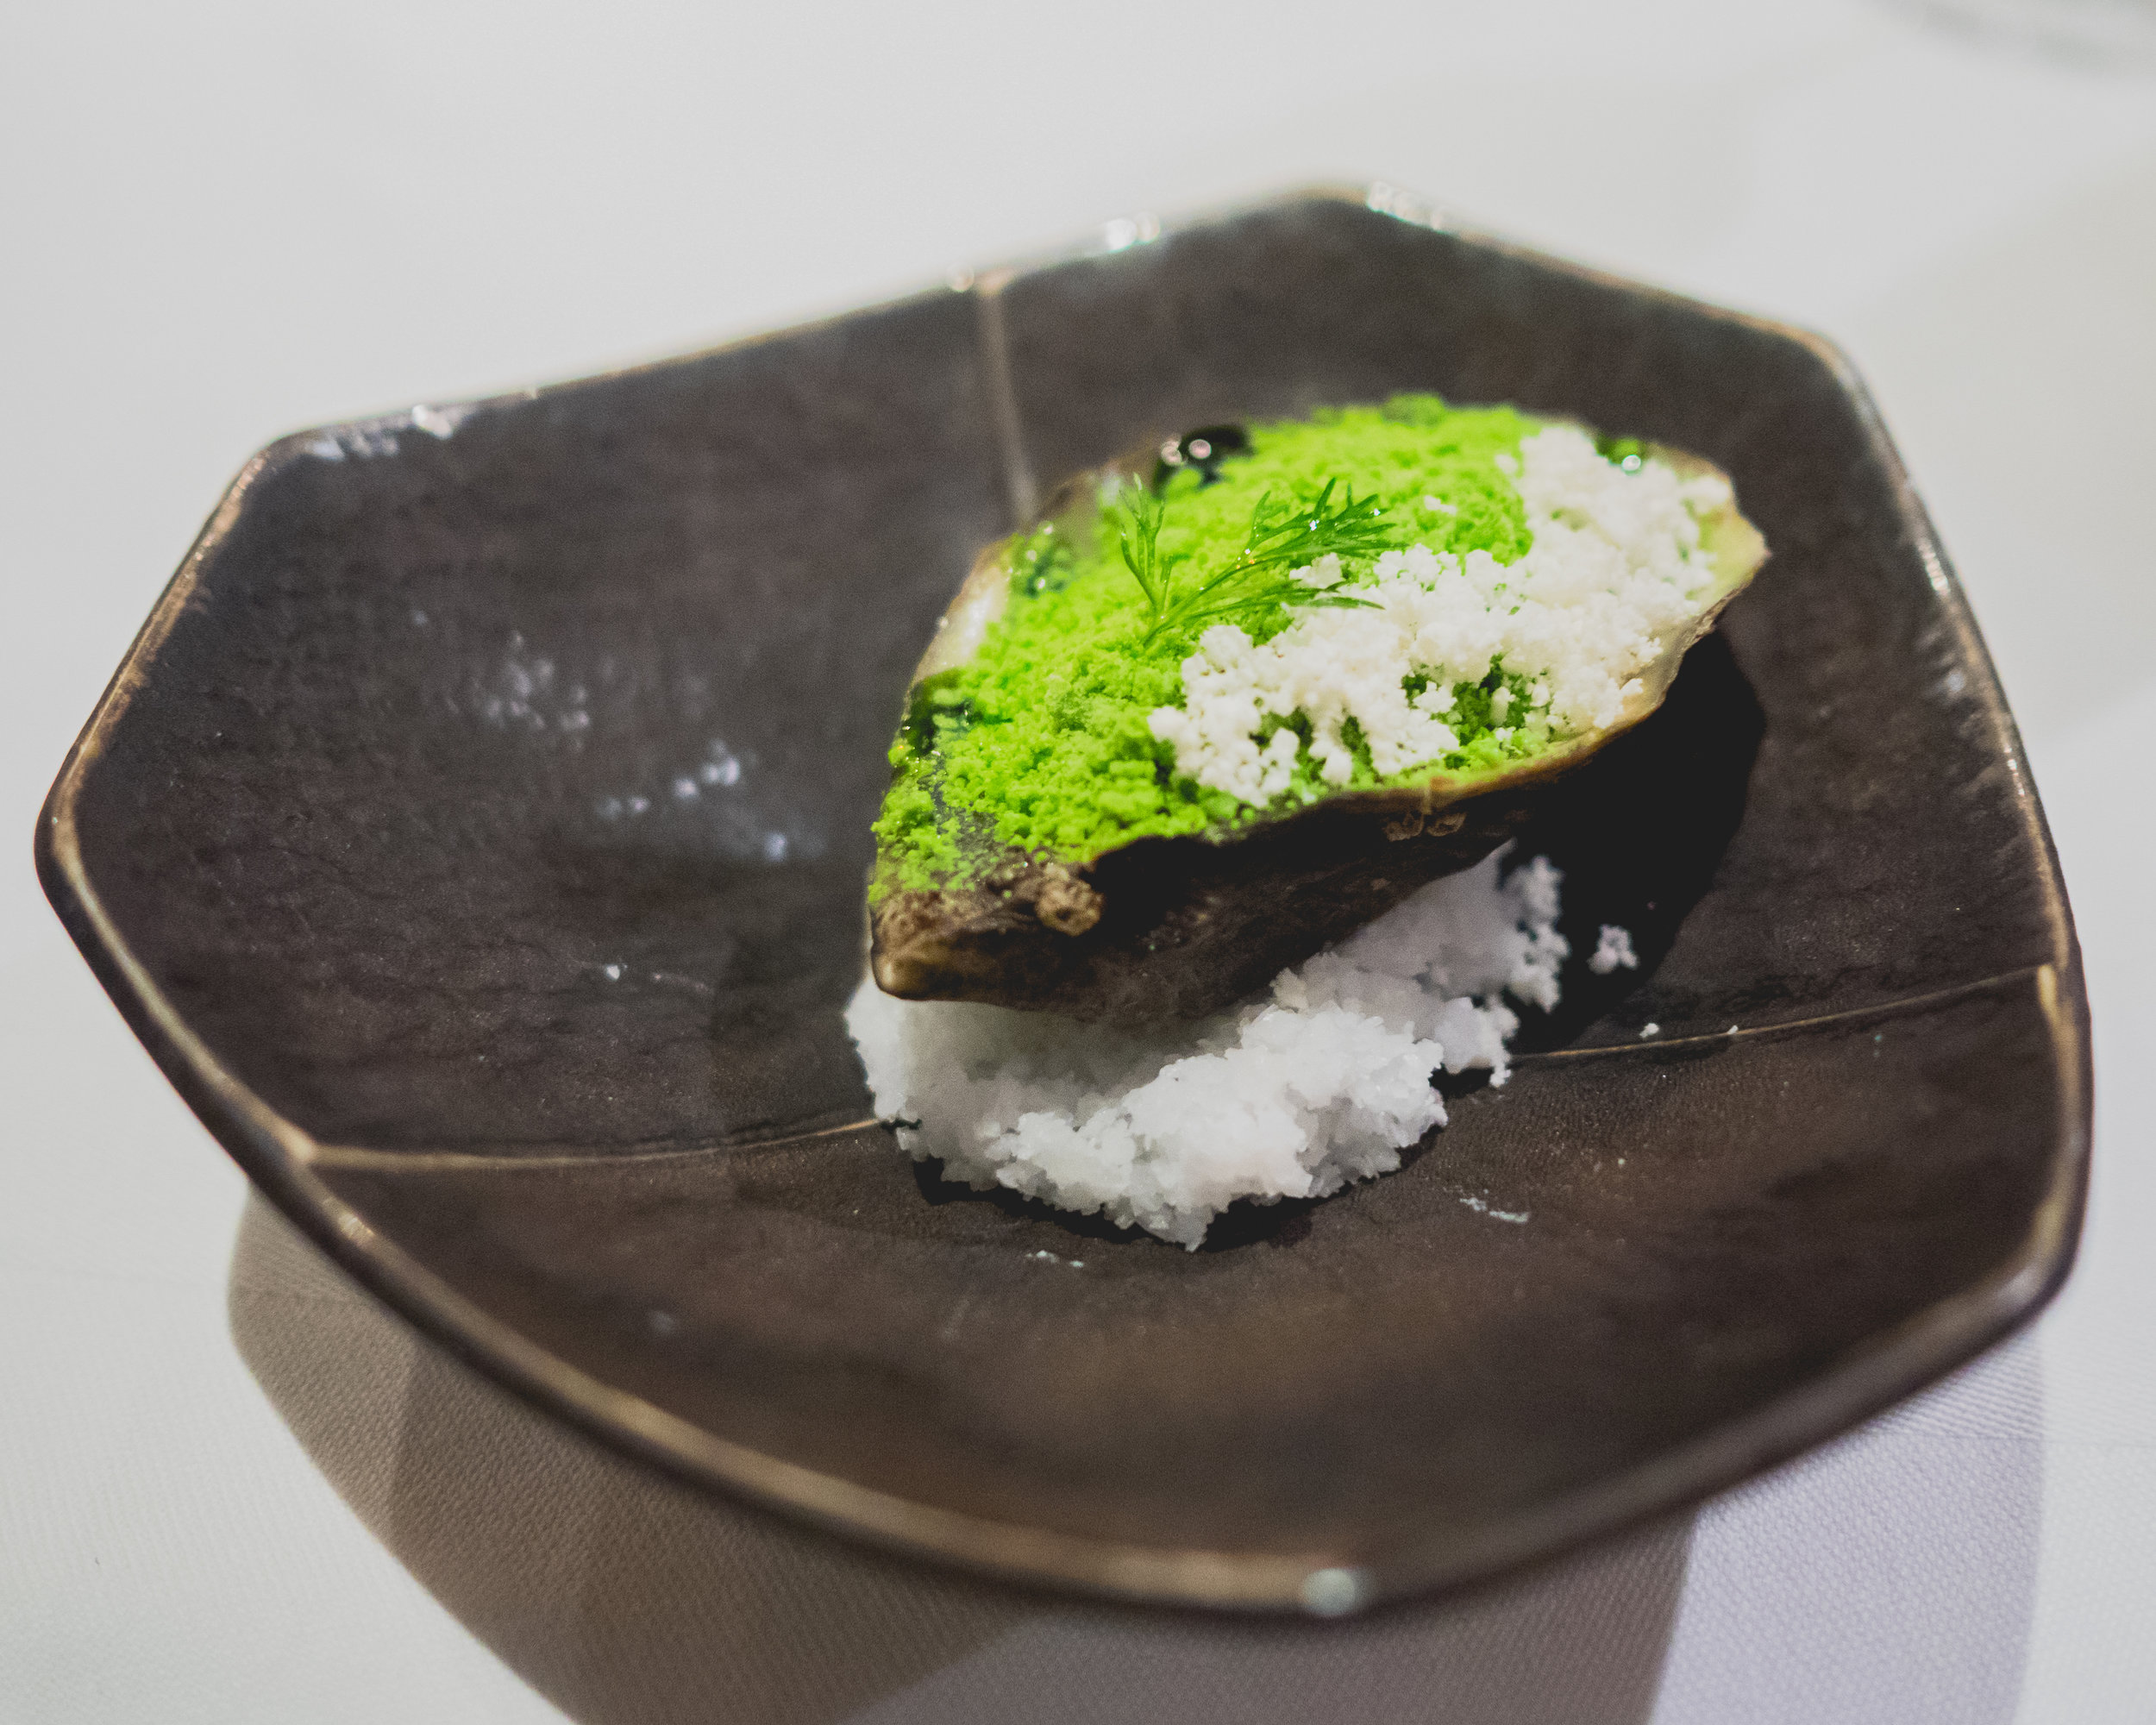 amuse: cold-smoked shigoku oyster, horseradish powder, dill powder, dill oil.